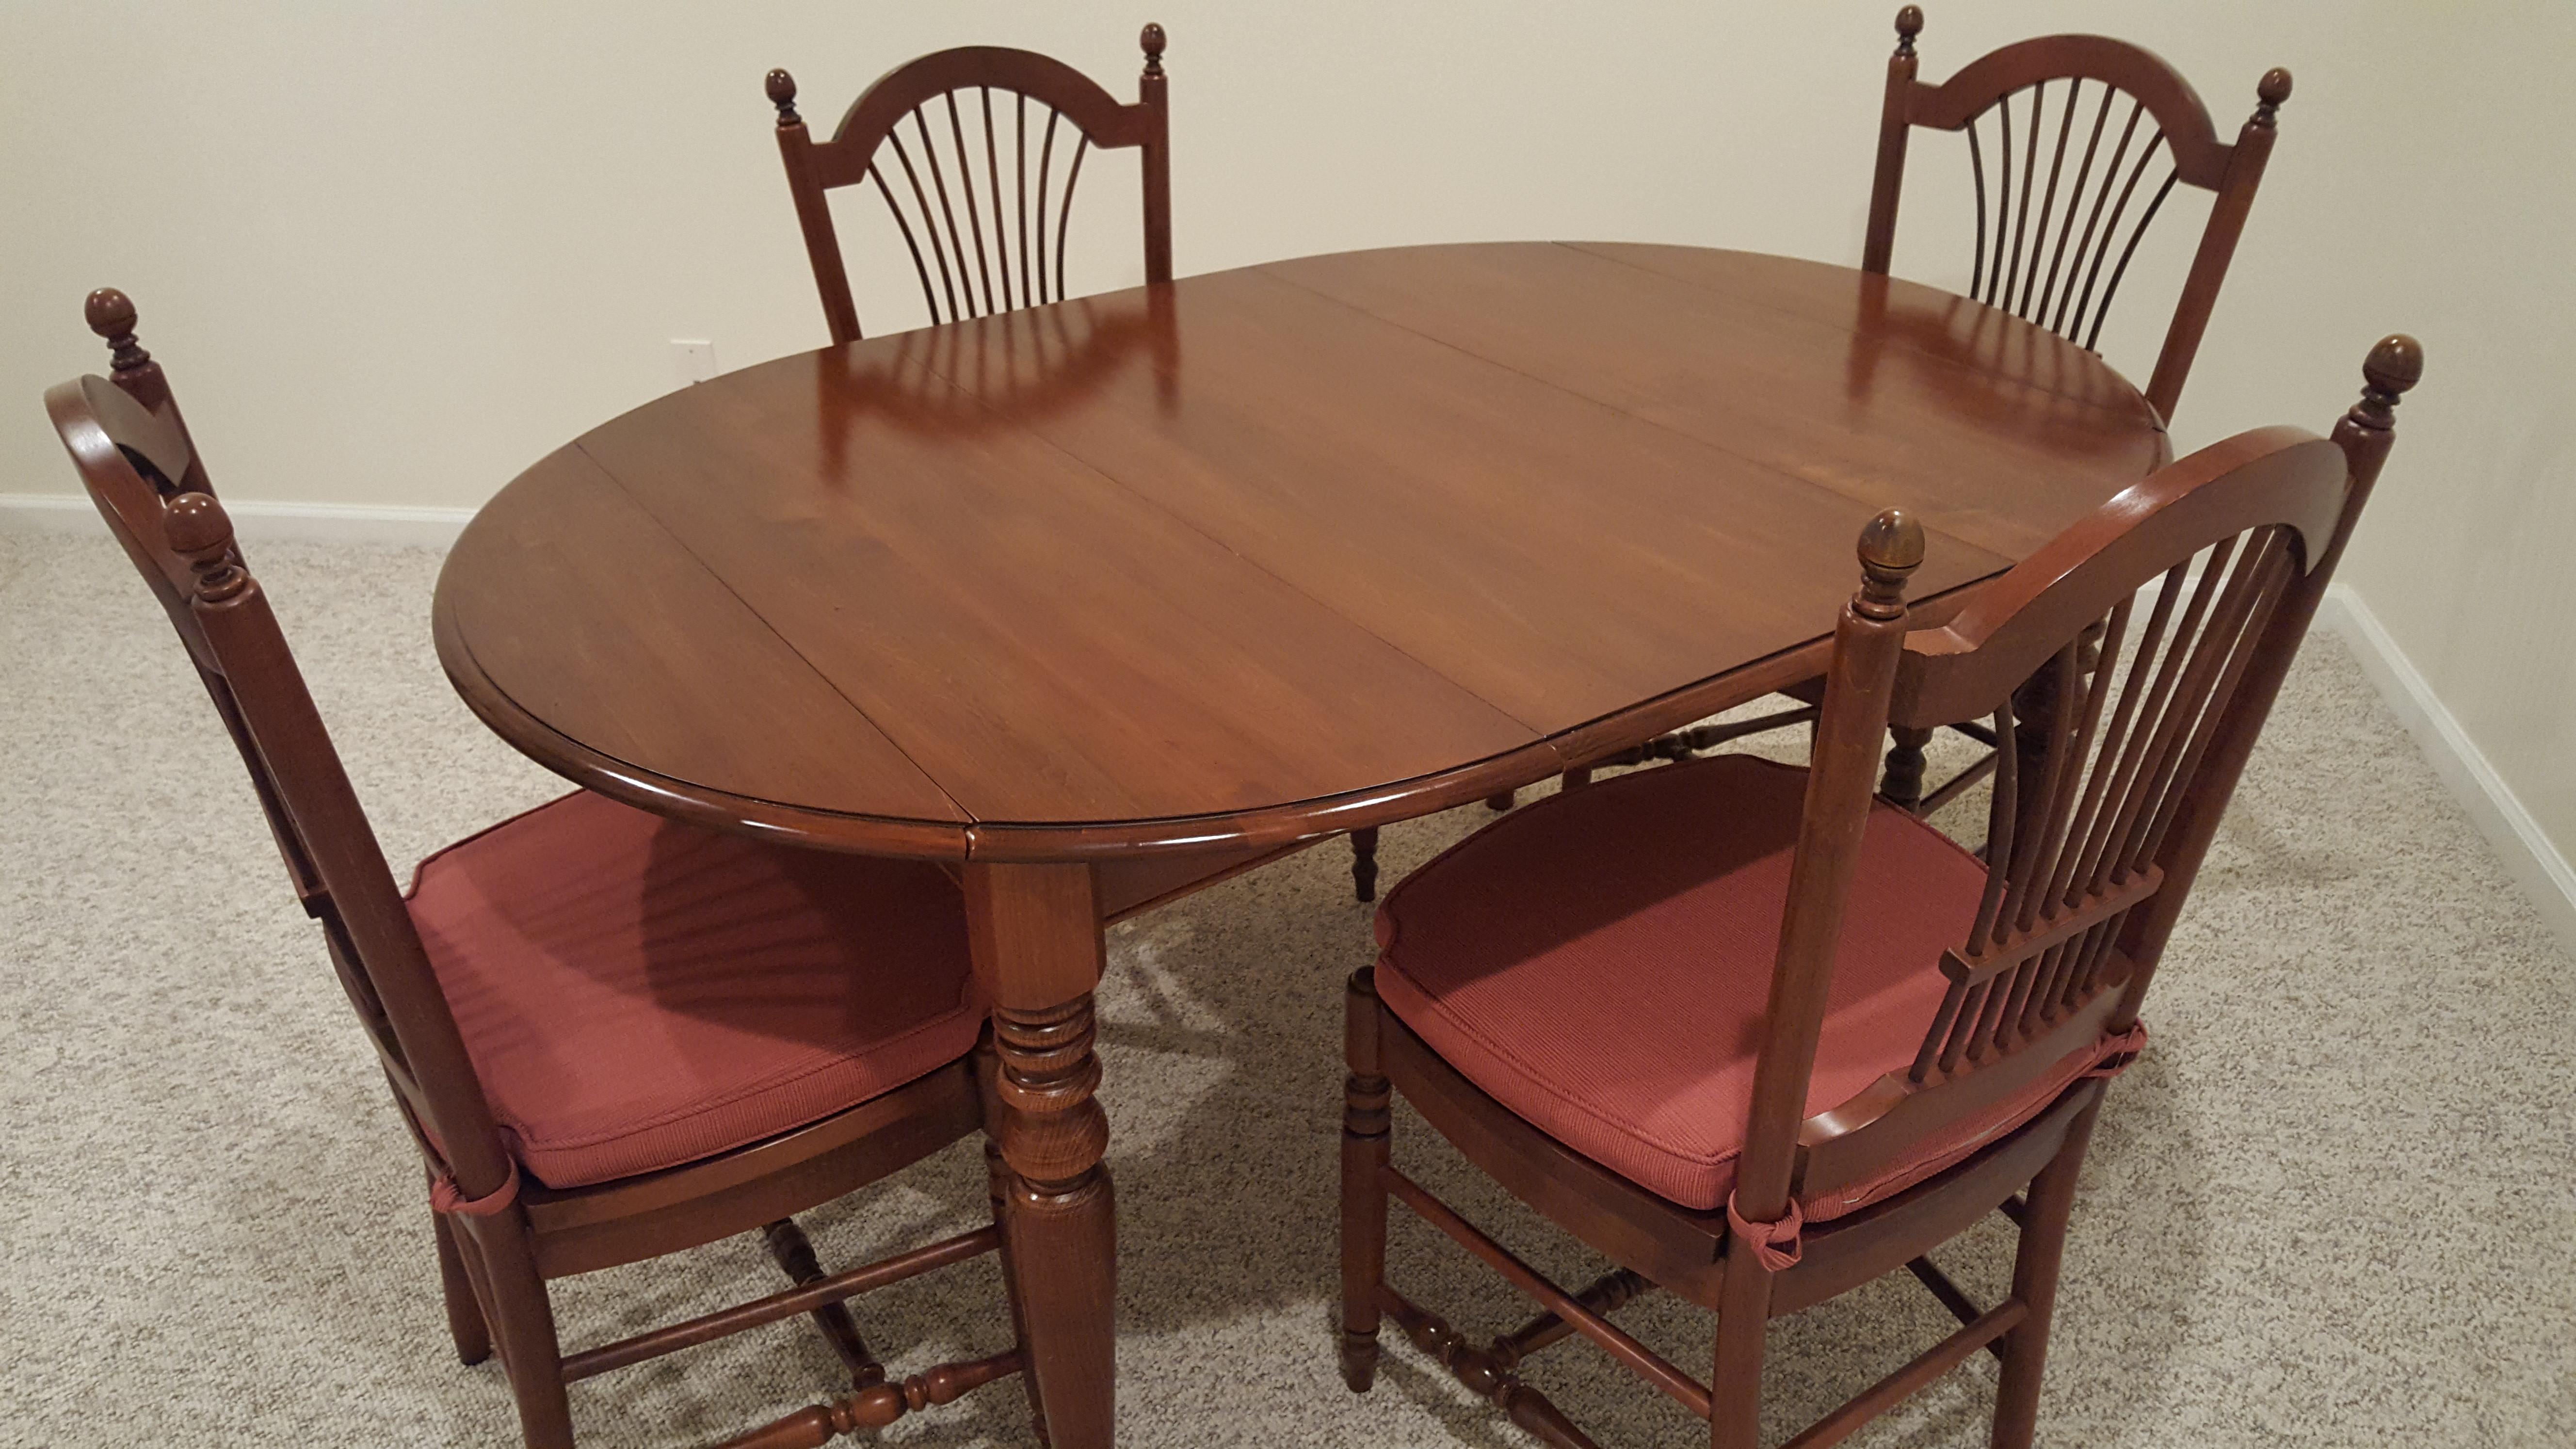 Ethan Allen 5-Piece Dining Set